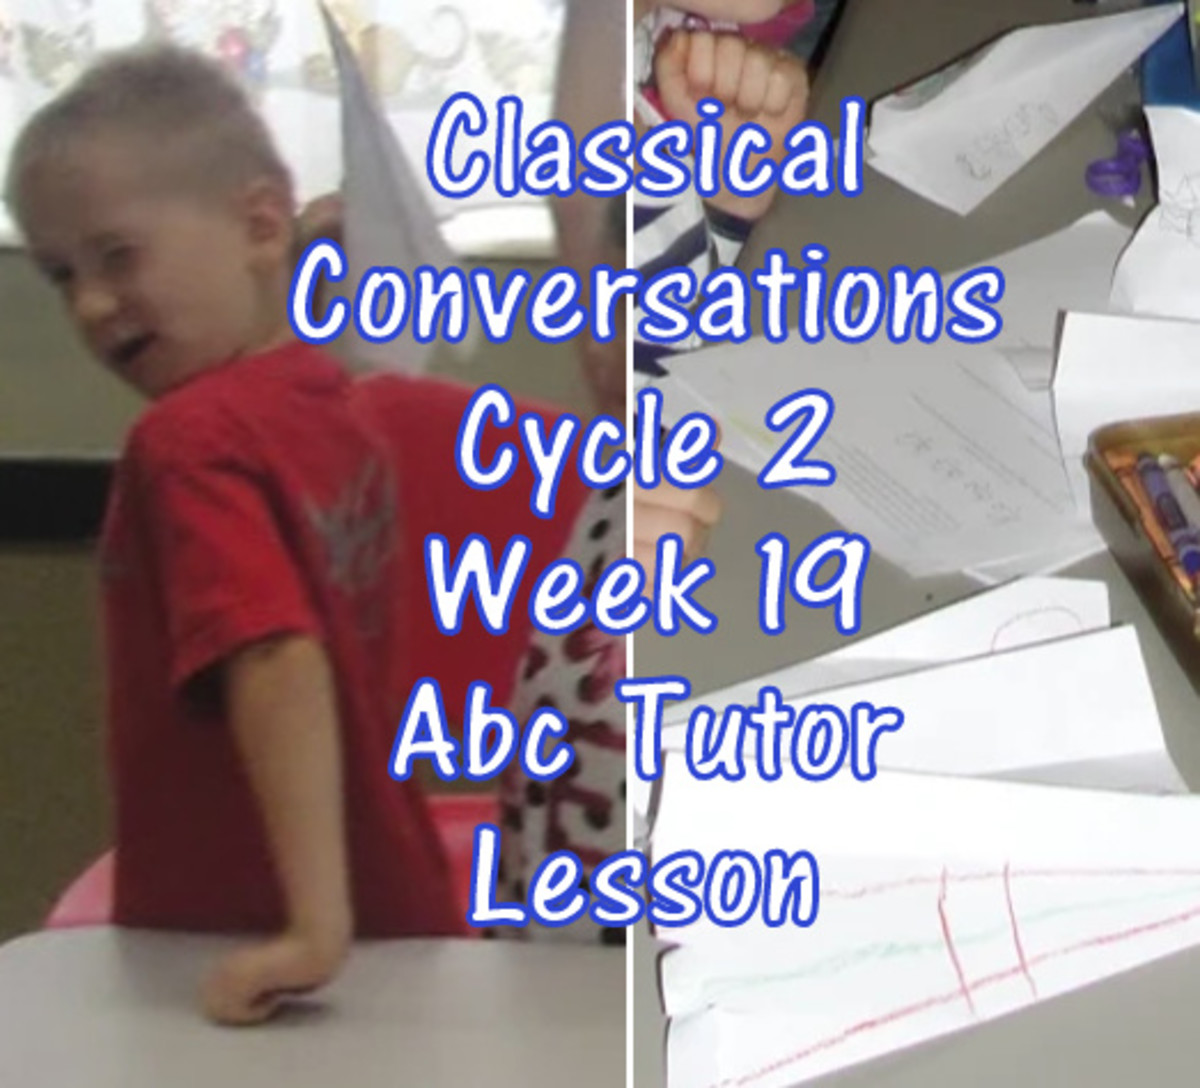 Cc Cycle 2 Week 19 Lesson For Abecedarian Tutors